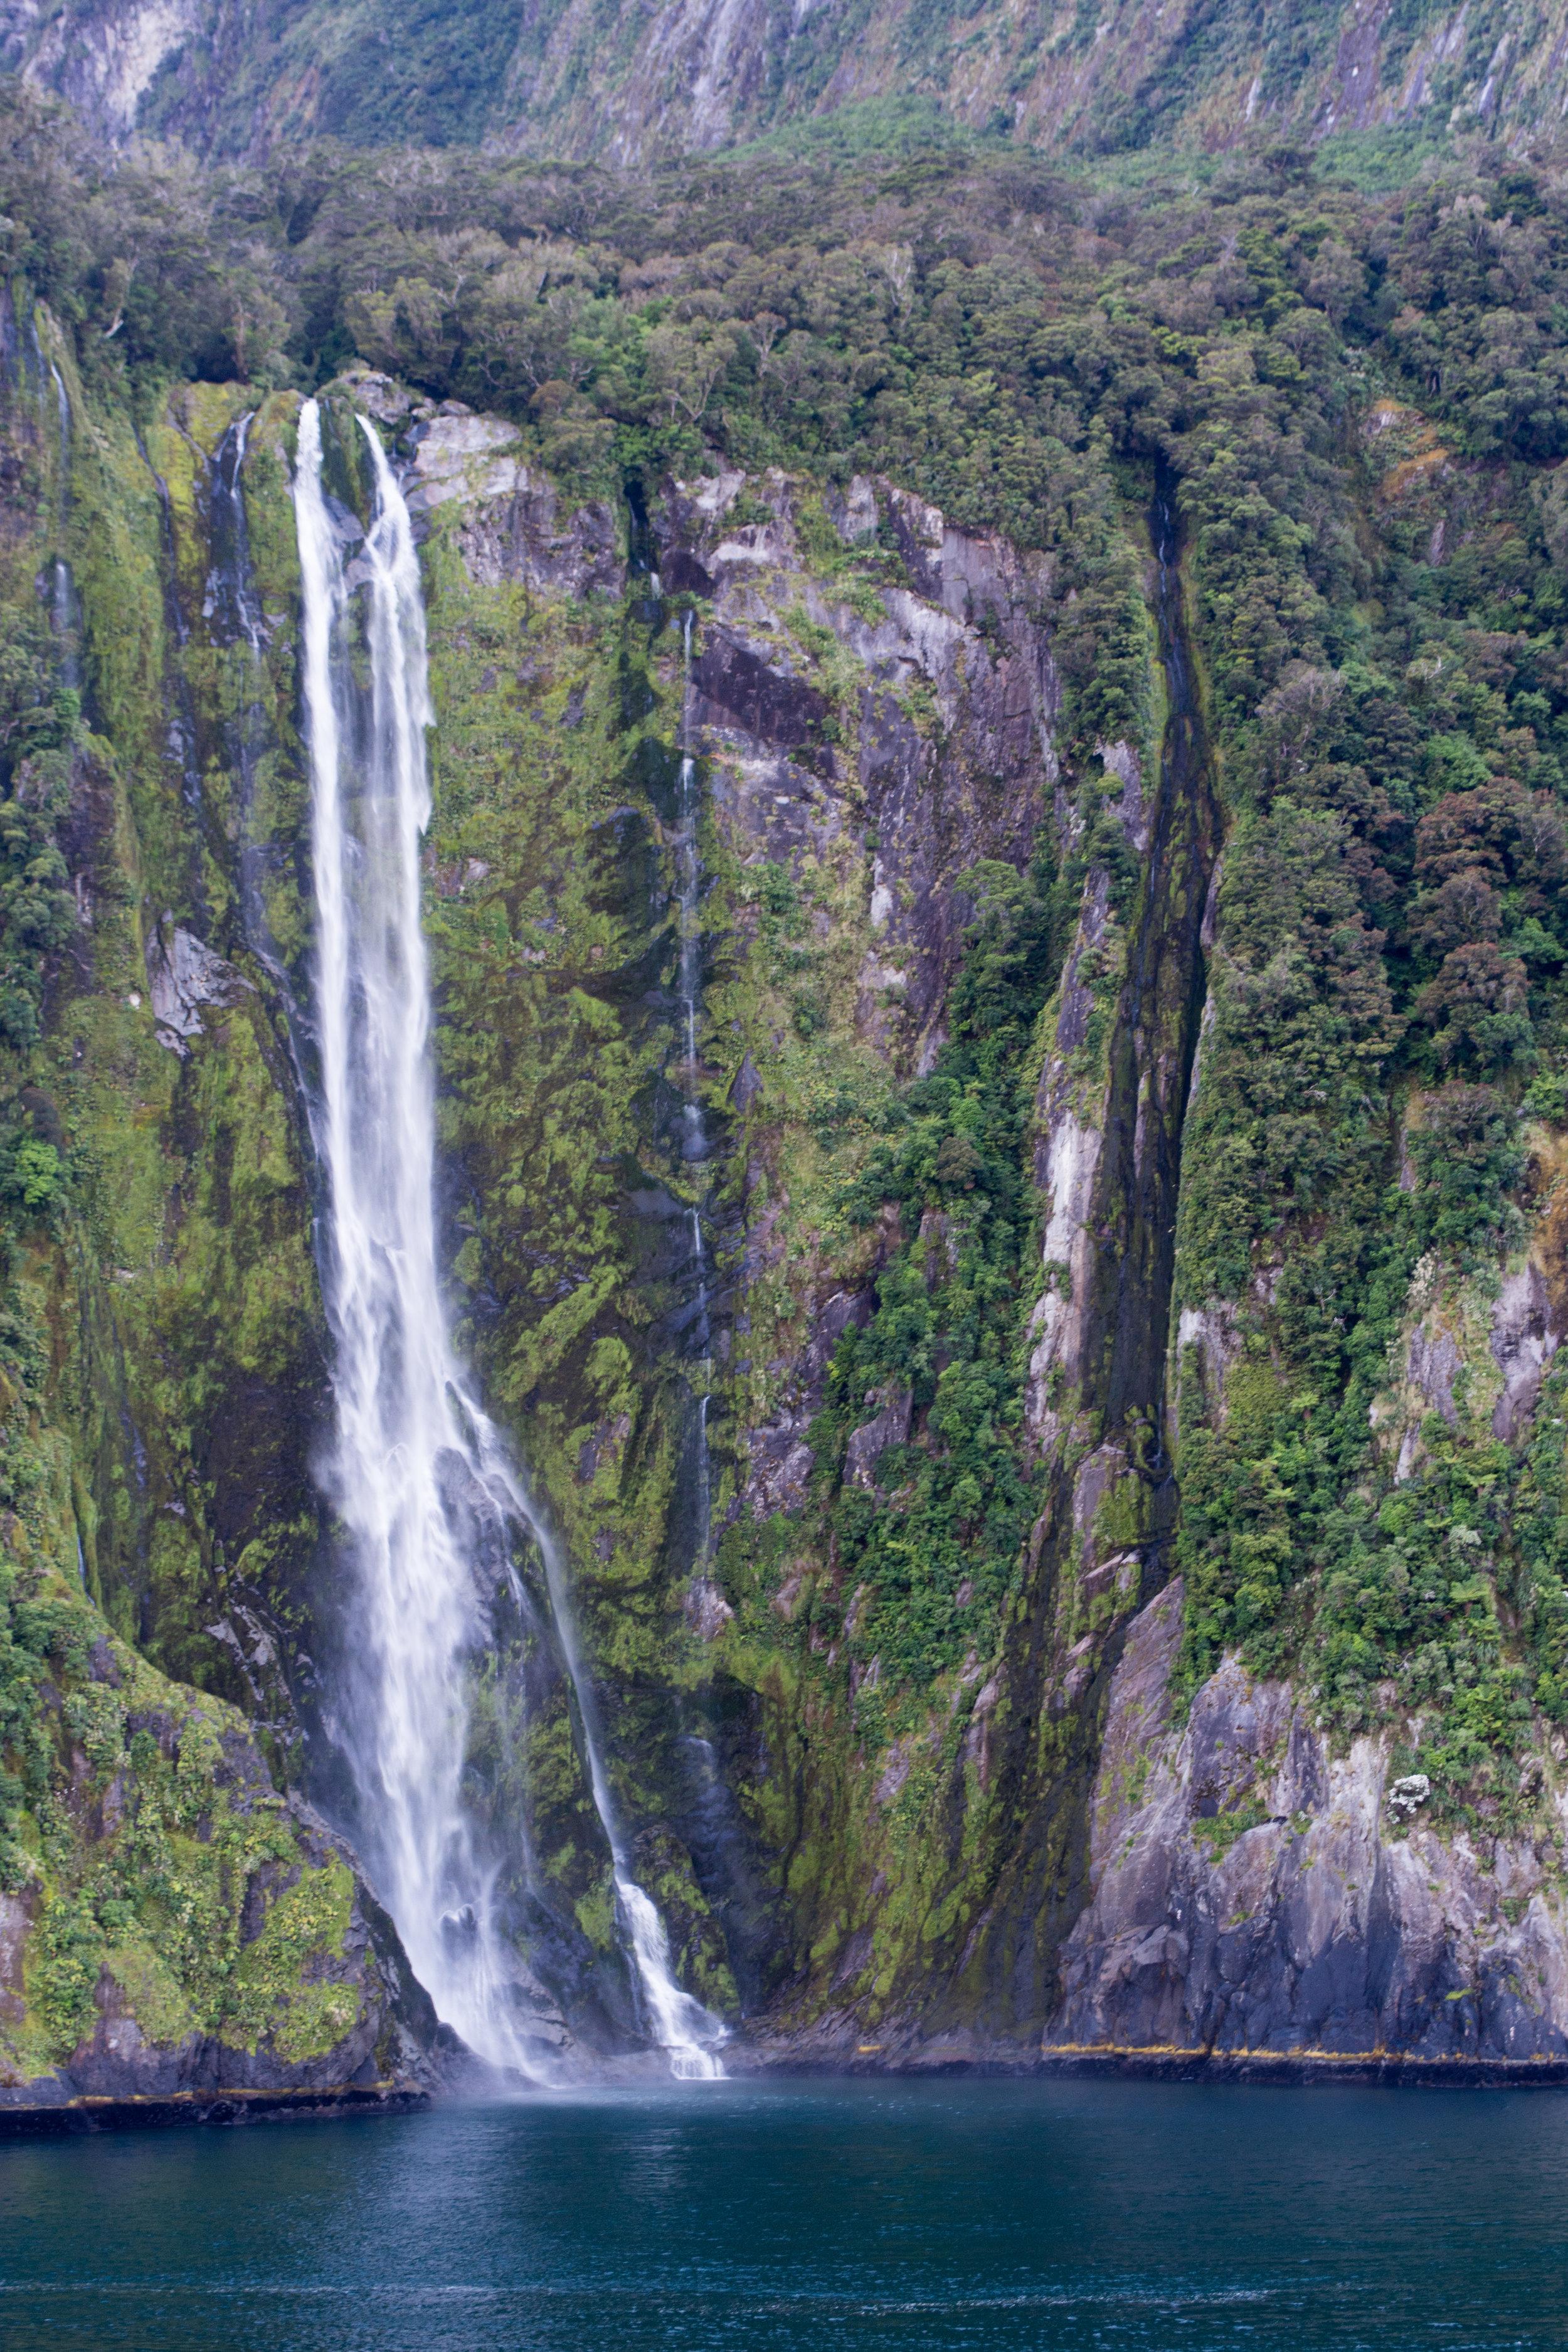 Stirling Falls at Milford Sound